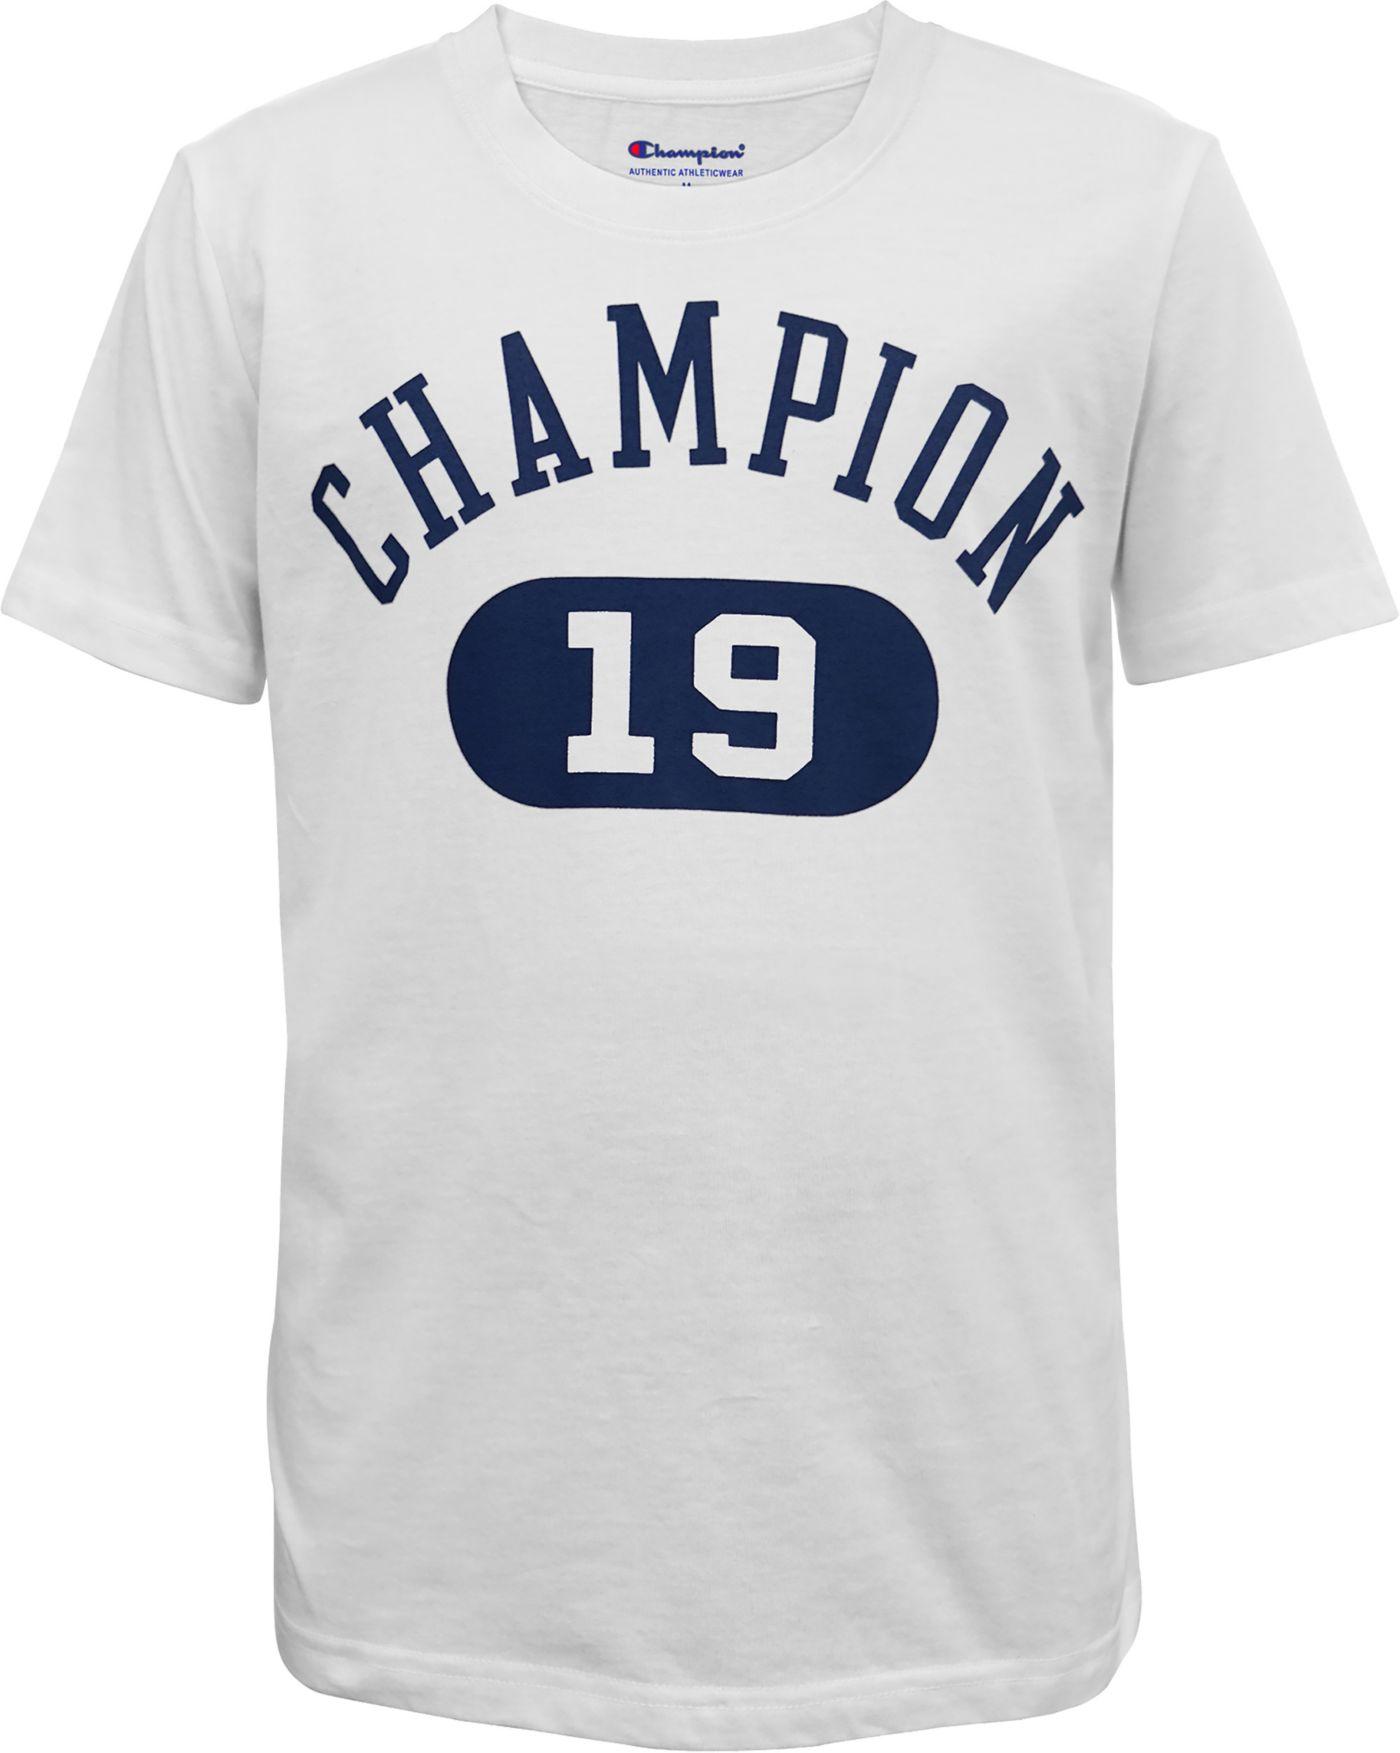 Champion Boys' Graphic T-Shirt